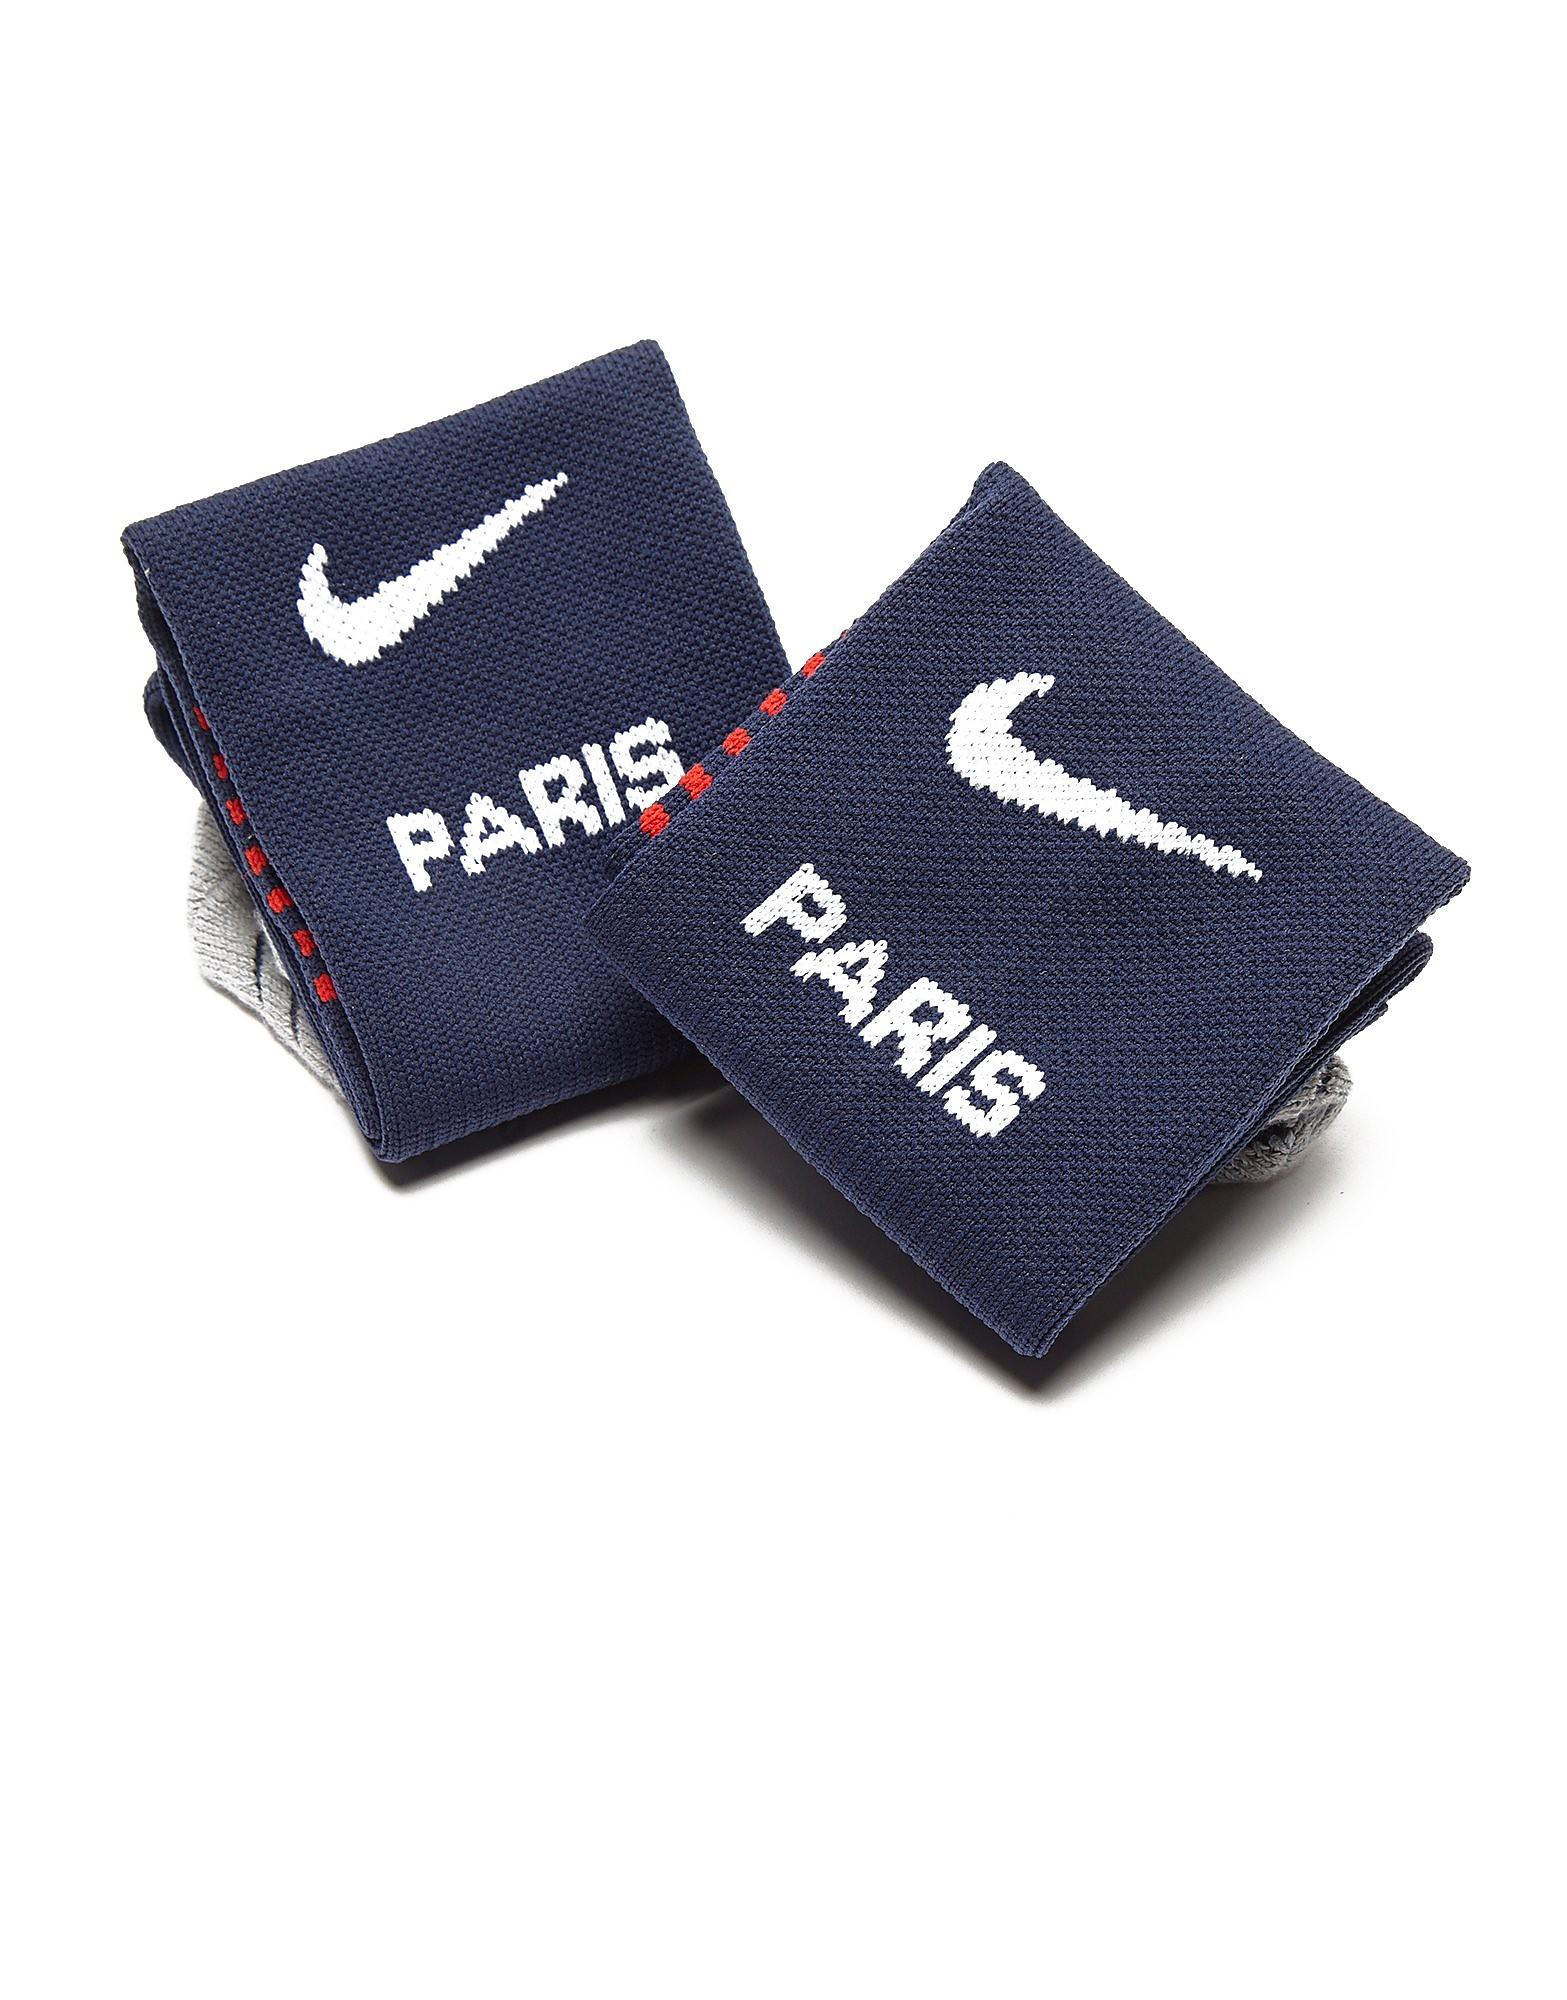 Nike Paris Saint Germain 2016/17 Home Socks Junior